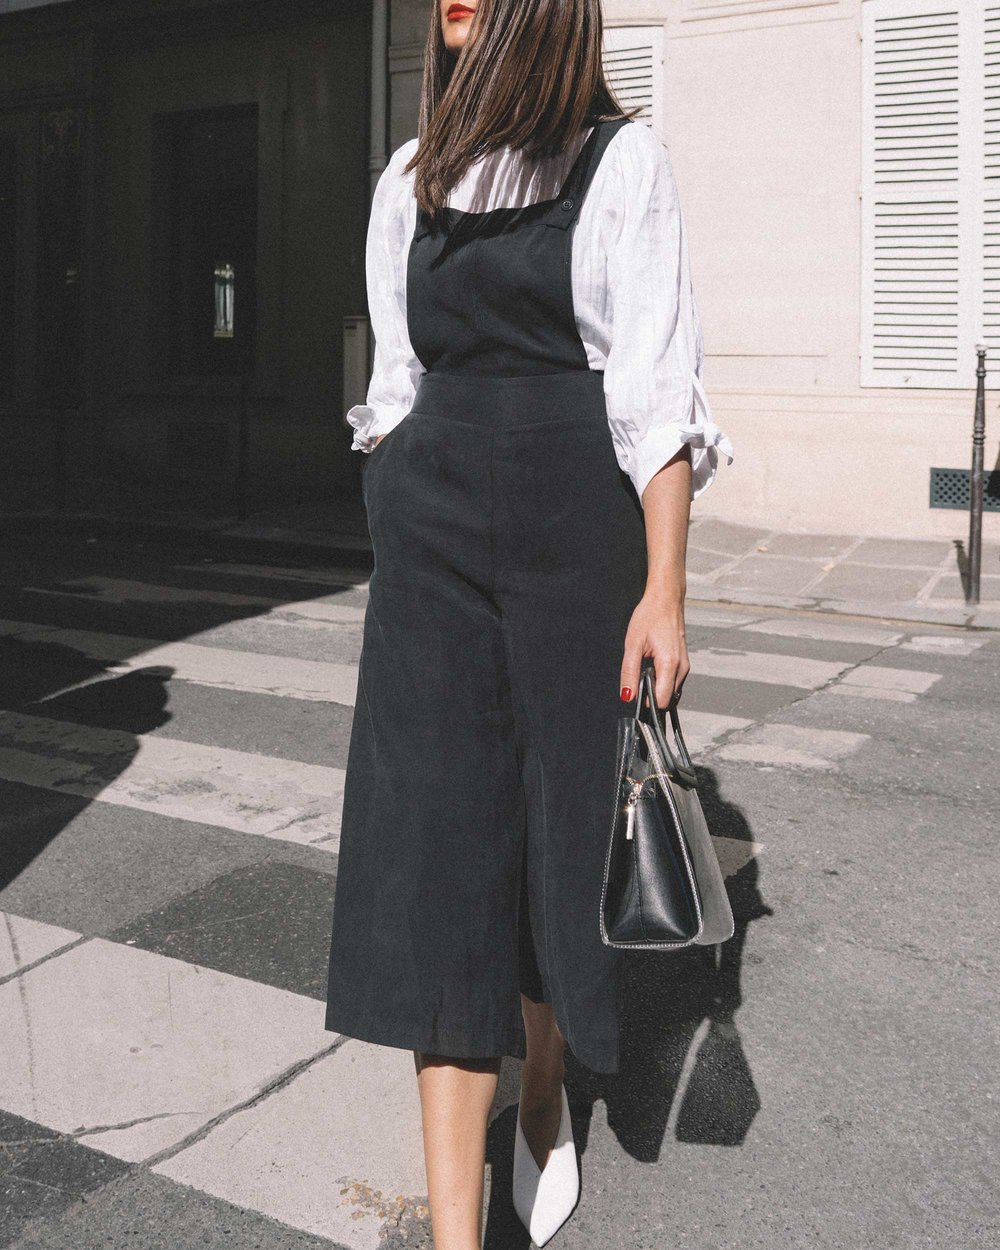 Black Culotte Overall Jumpsuit Paris Outfit1.jpg